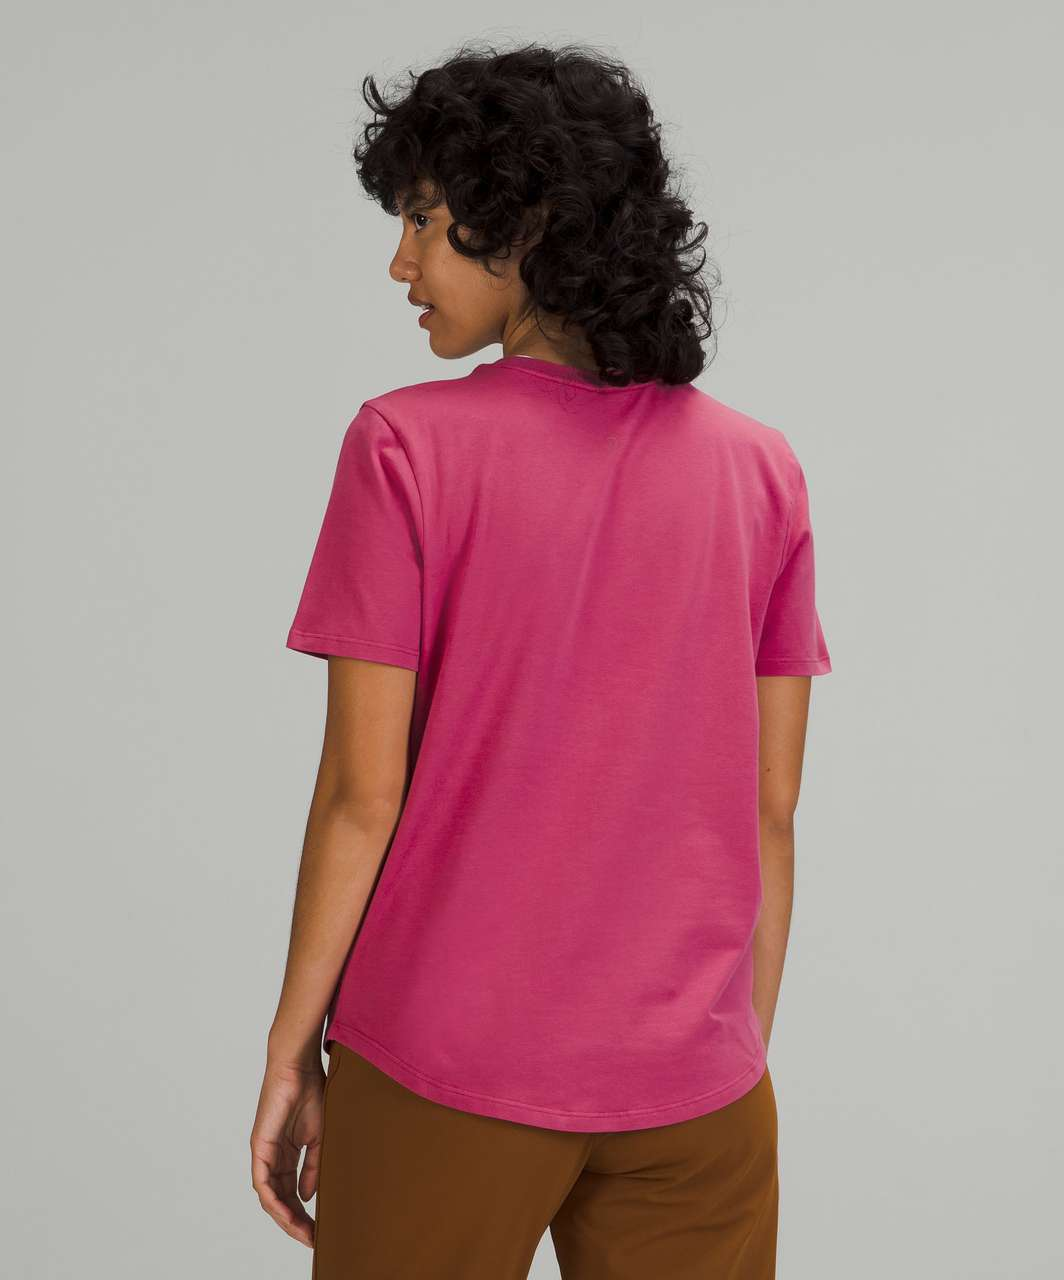 Lululemon Love Crew T-Shirt - Pink Lychee